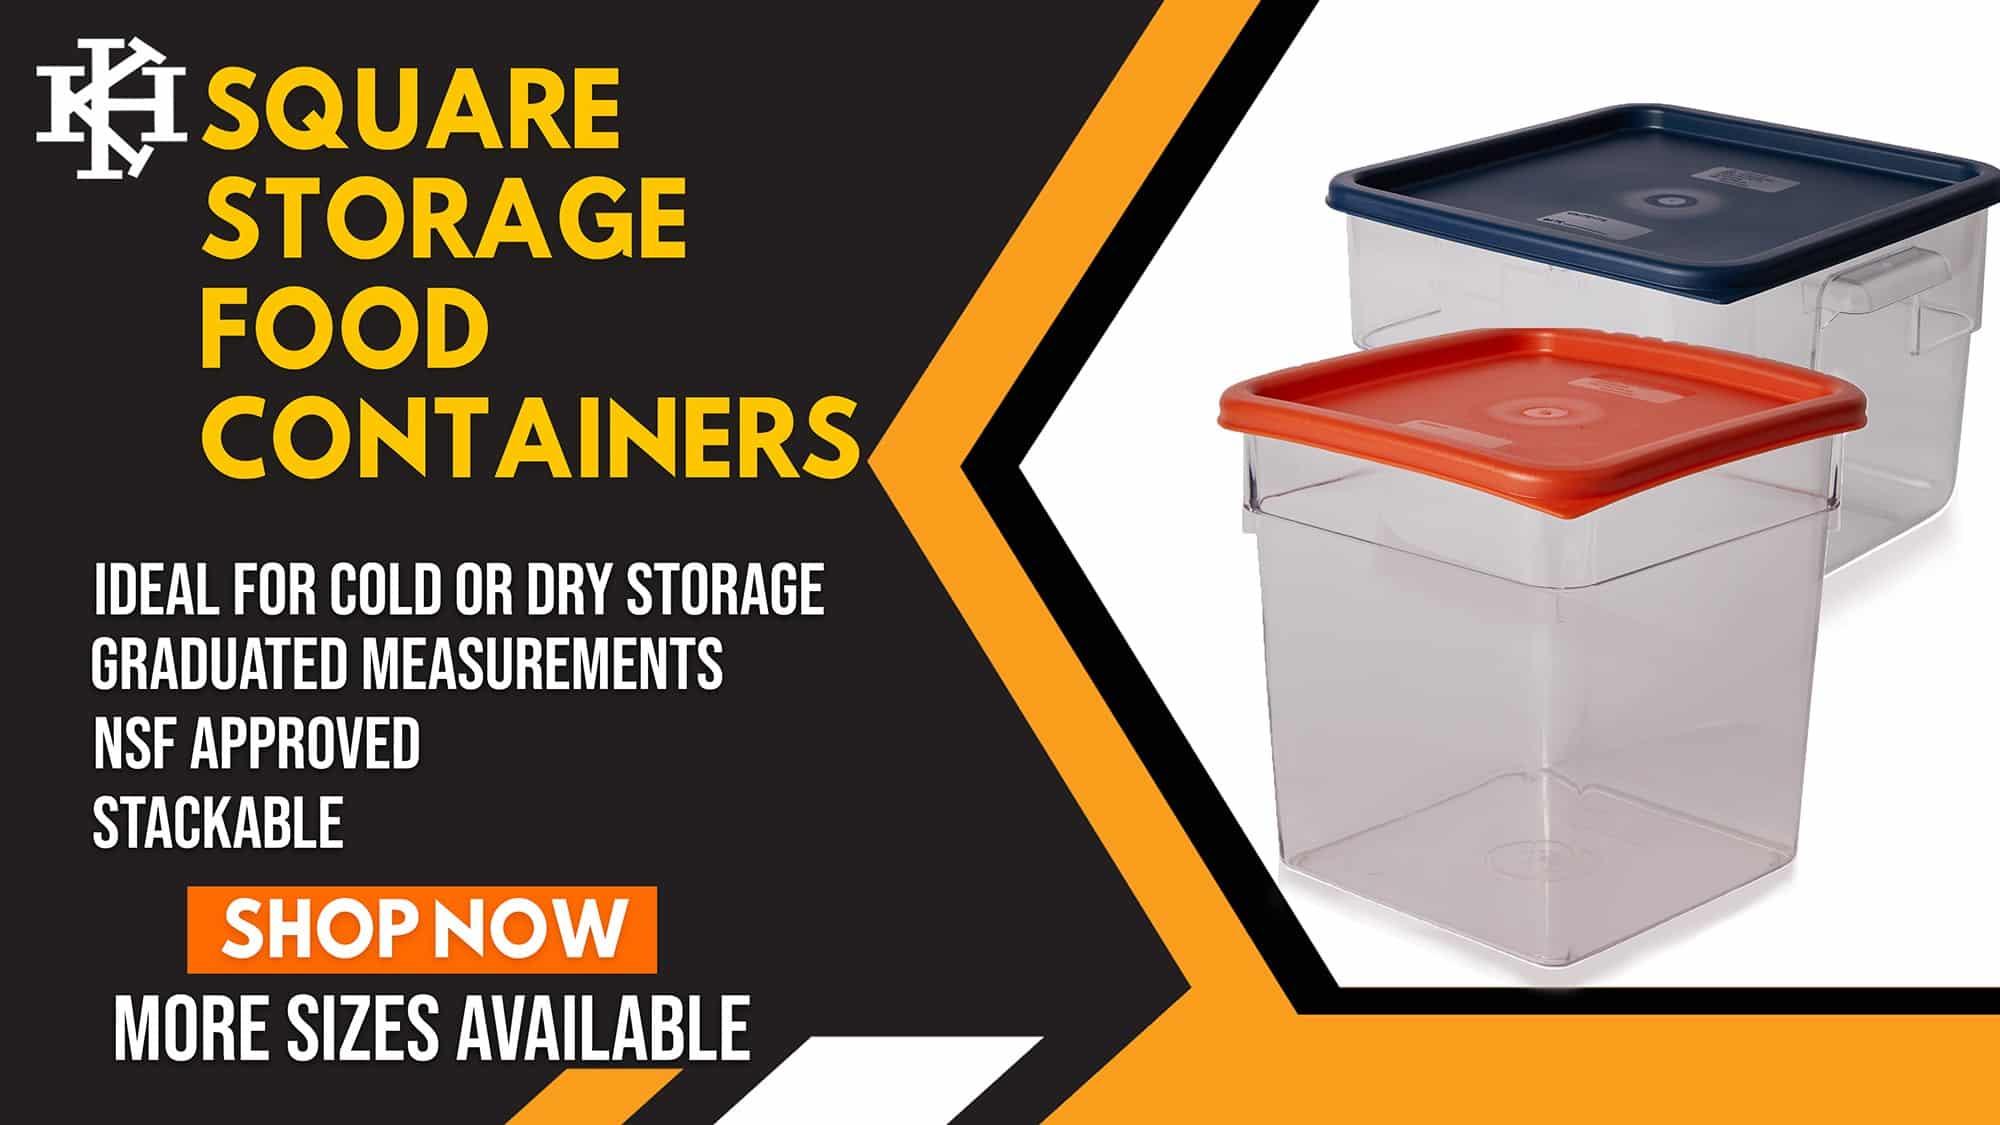 Square Storage Food Container